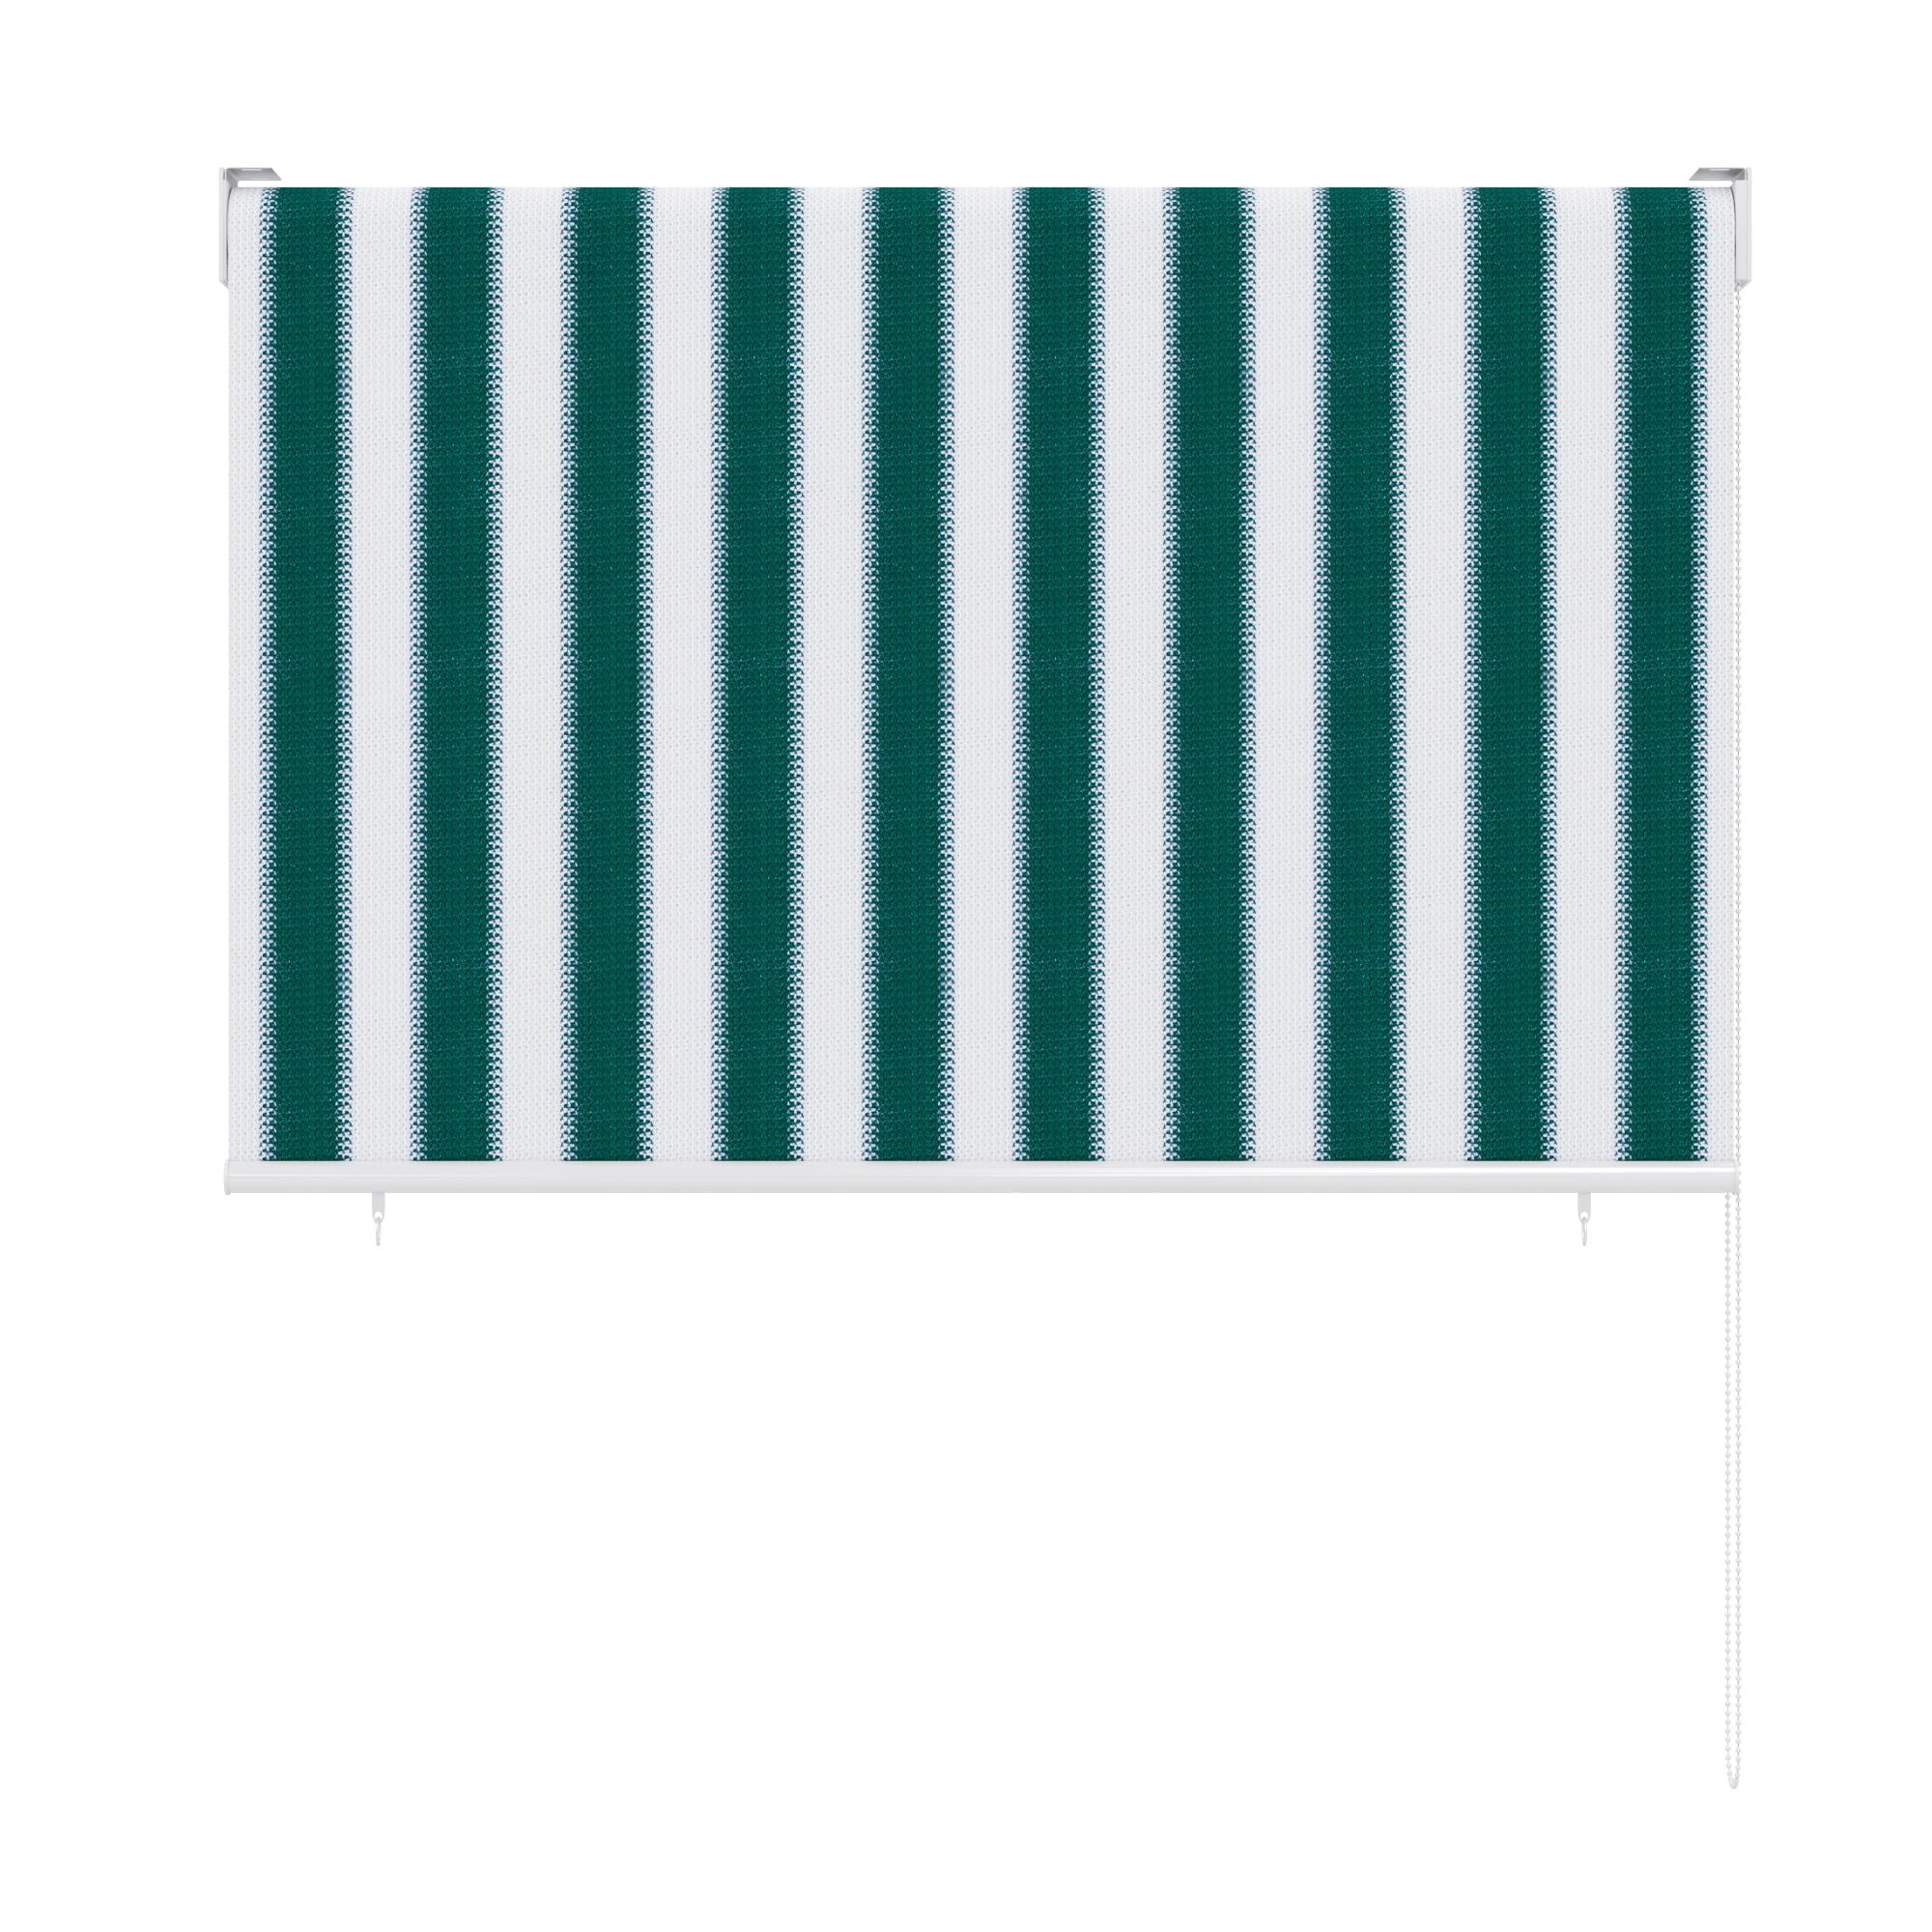 JAROLIFT-Senkrechtmarkise-Sichtschutz-Aussenrollo-Sonnenschutz-Aussen-Rollo-Balkon Indexbild 29